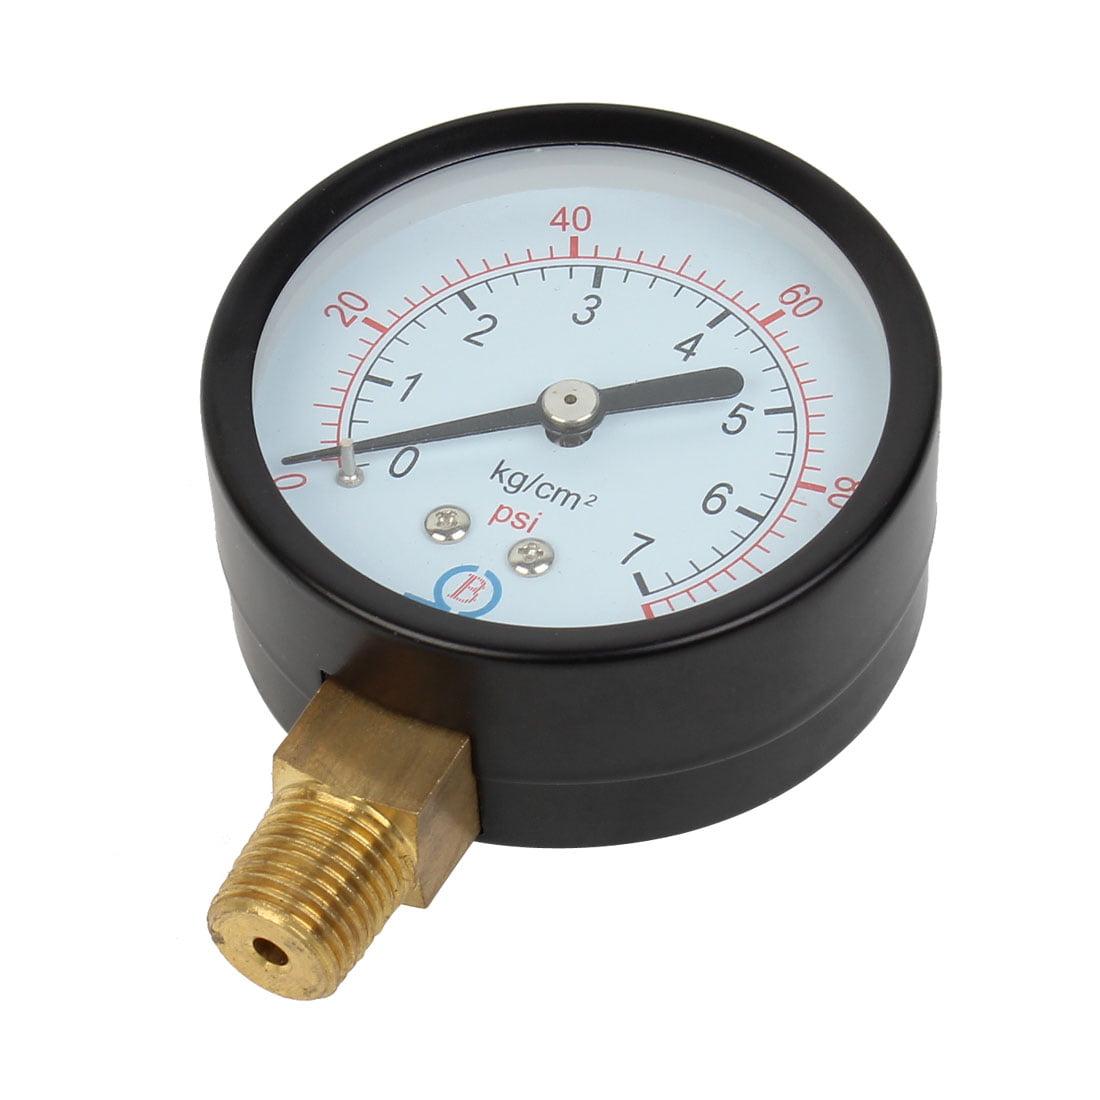 Air Compressor 1/4PT Male Thread Connector 0-7kg/cm2 0-100Psi Pressure Gauge